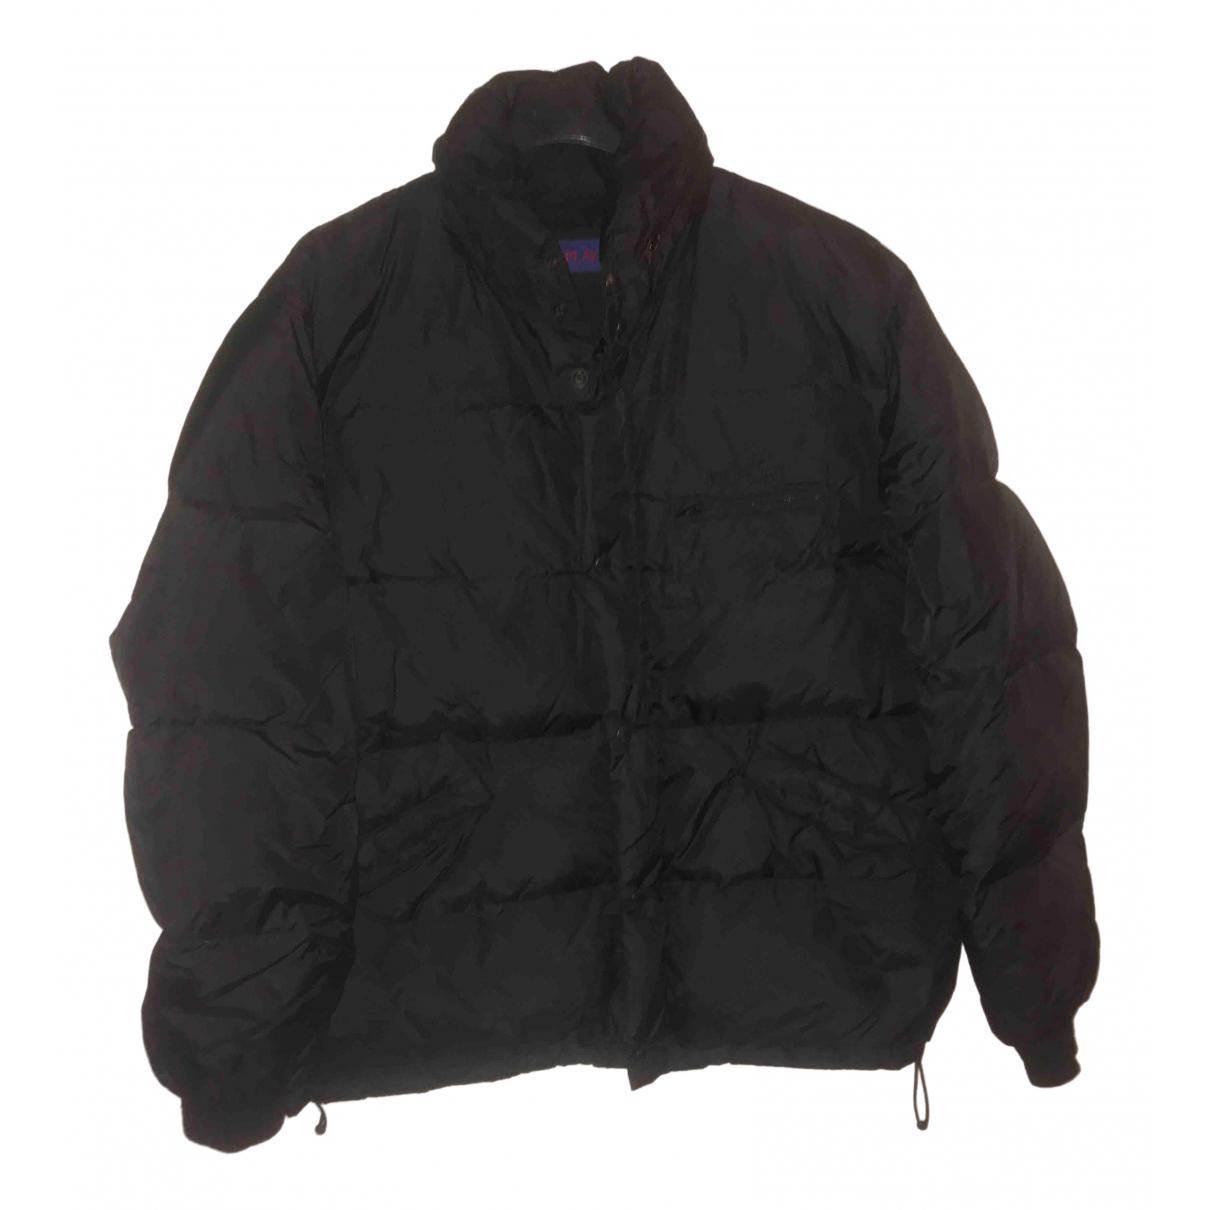 Replay \N Anthracite jacket  for Men M International